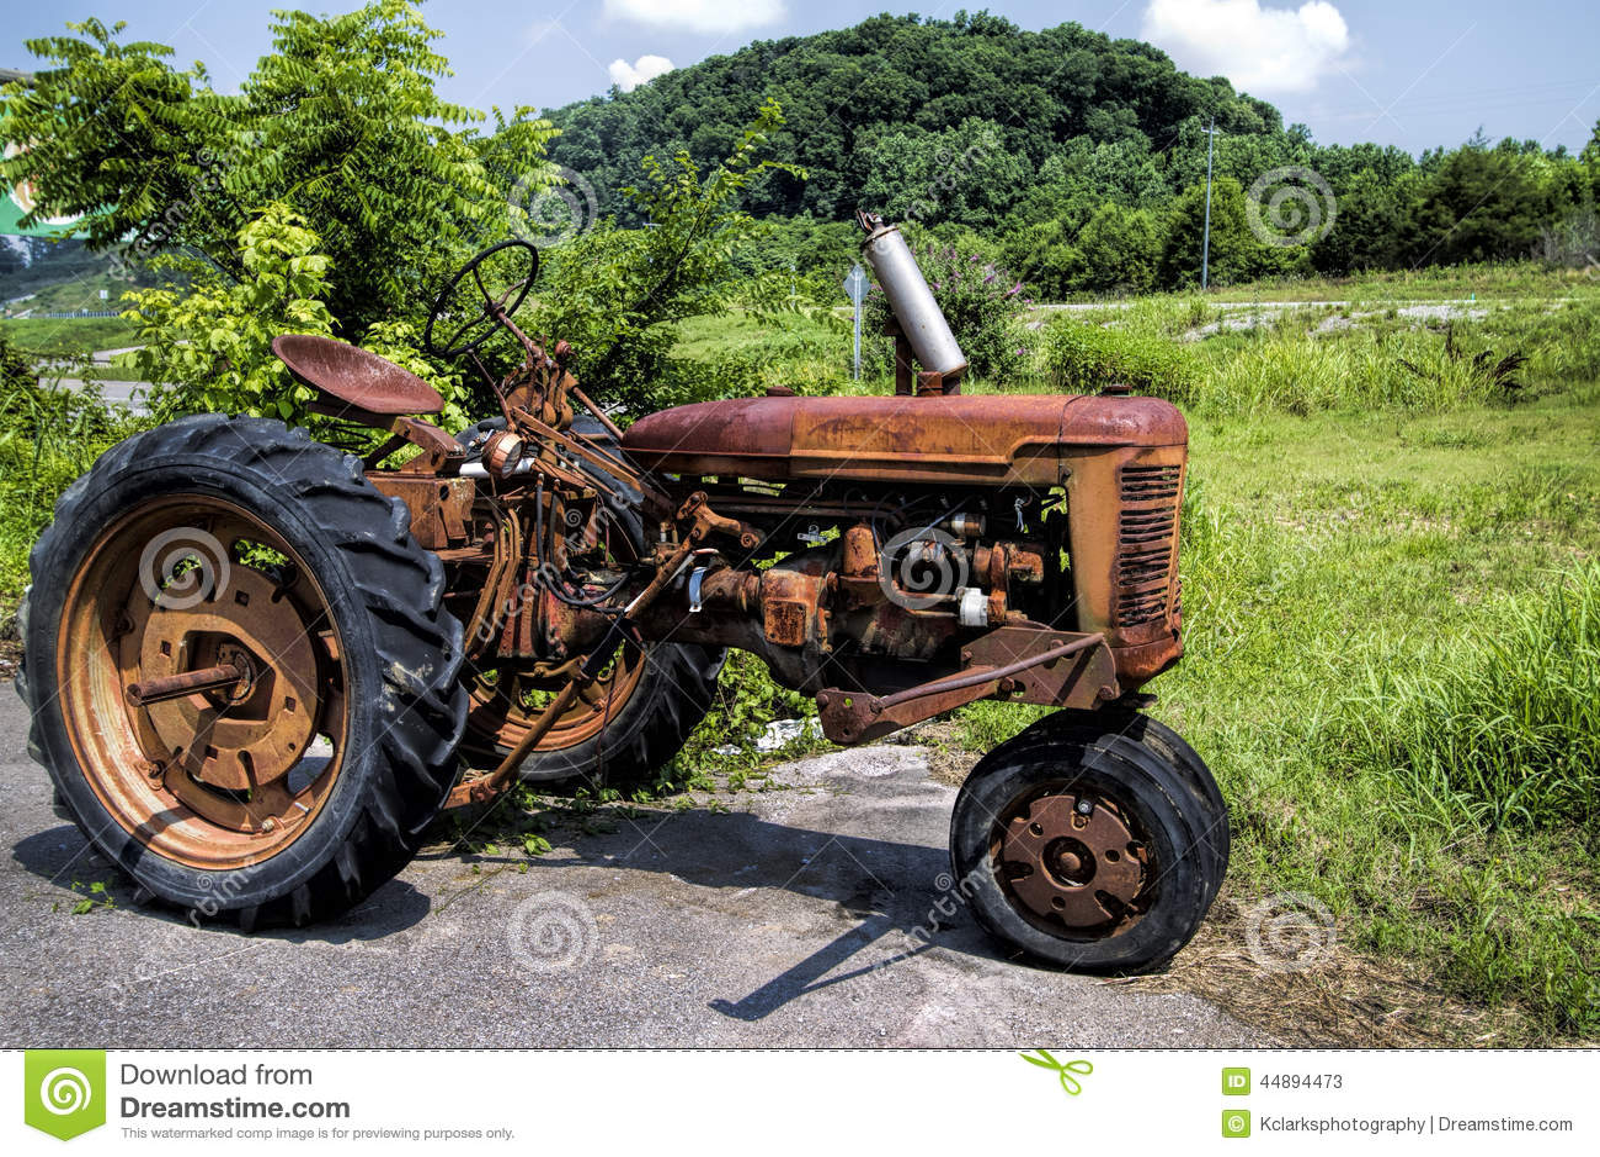 Tractor Broke Down : Broken down vintage red tractor stock photo image